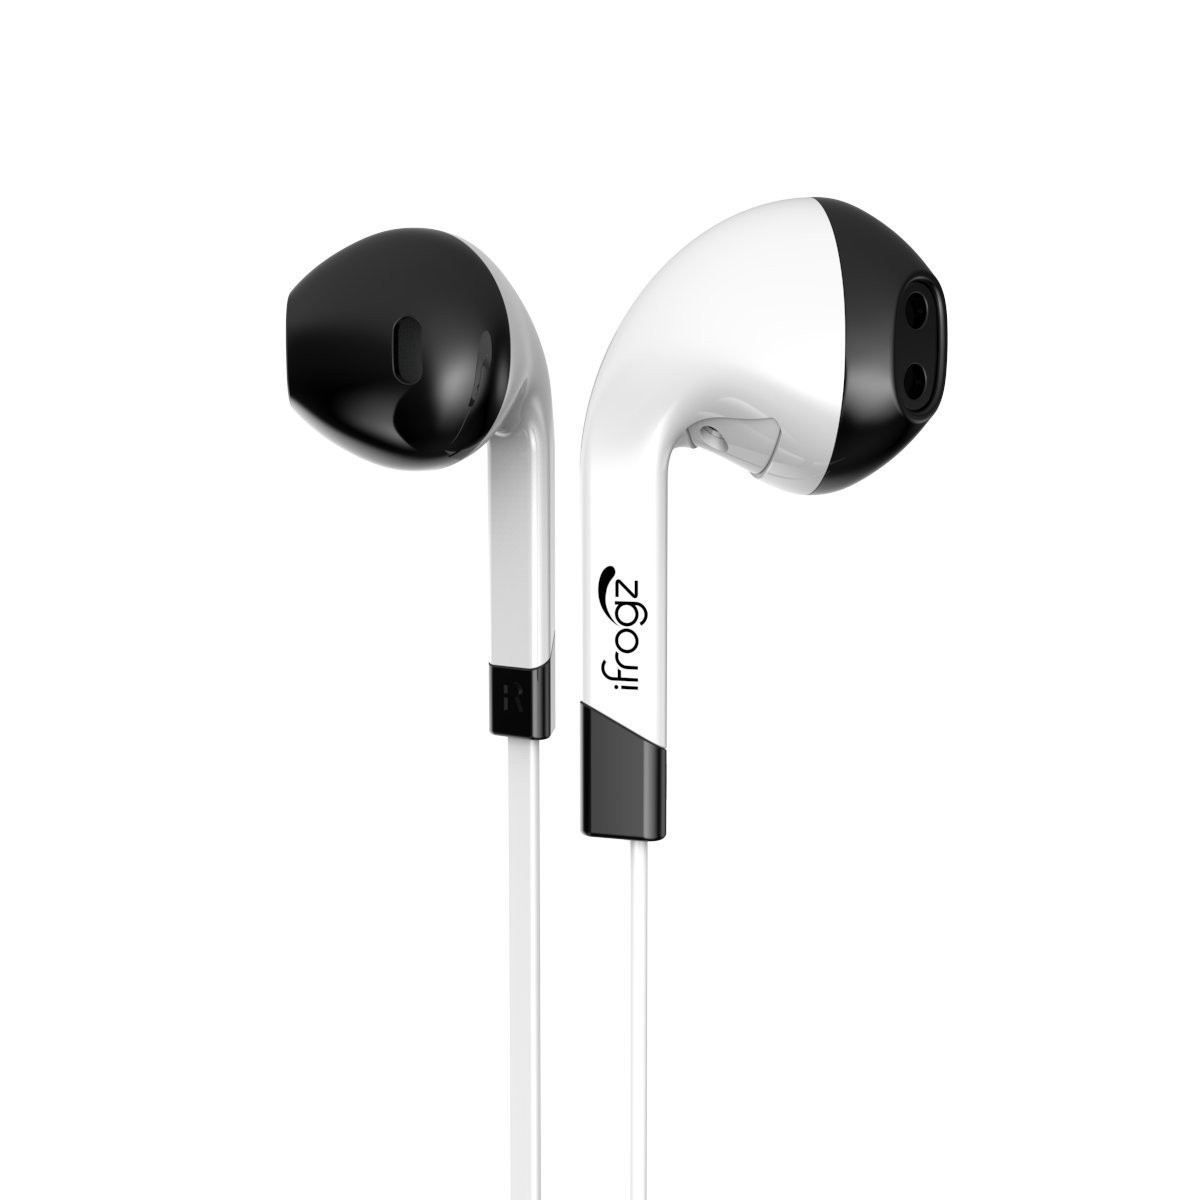 Ifrogz Intone Wireless Earbuds - White $39.99 on